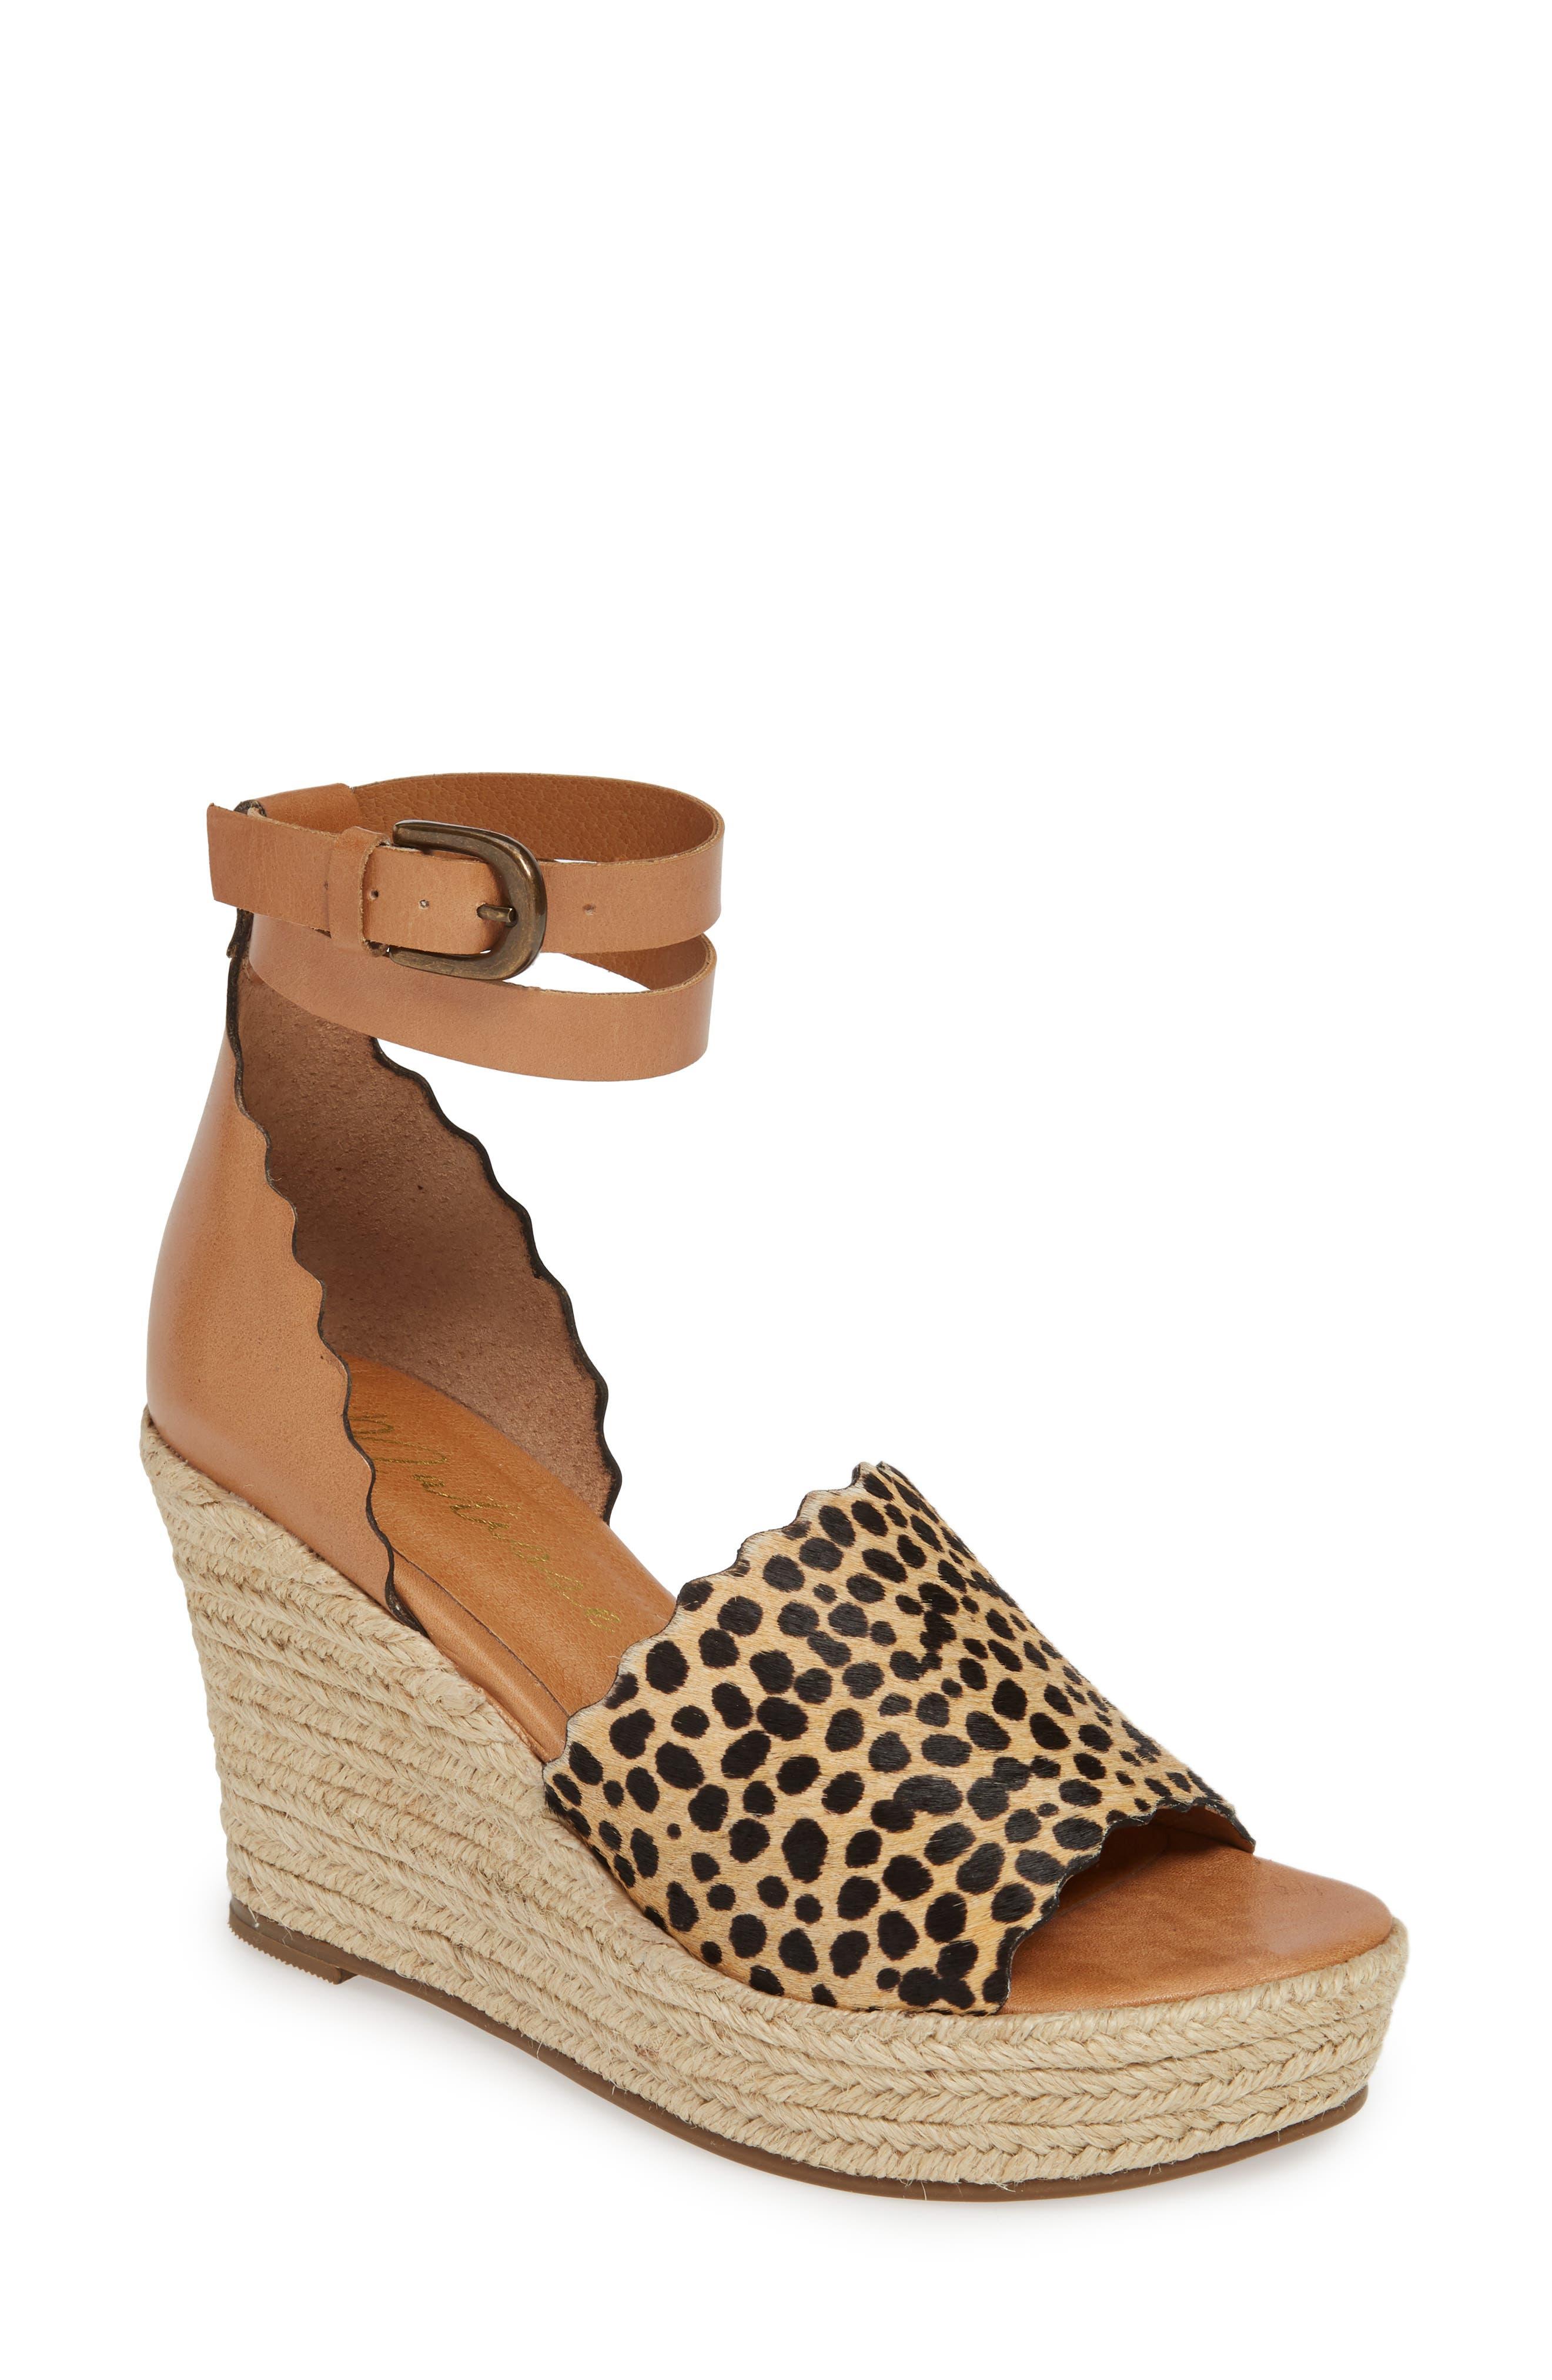 Matisse Roma Espadrille Wedge Sandal, Brown